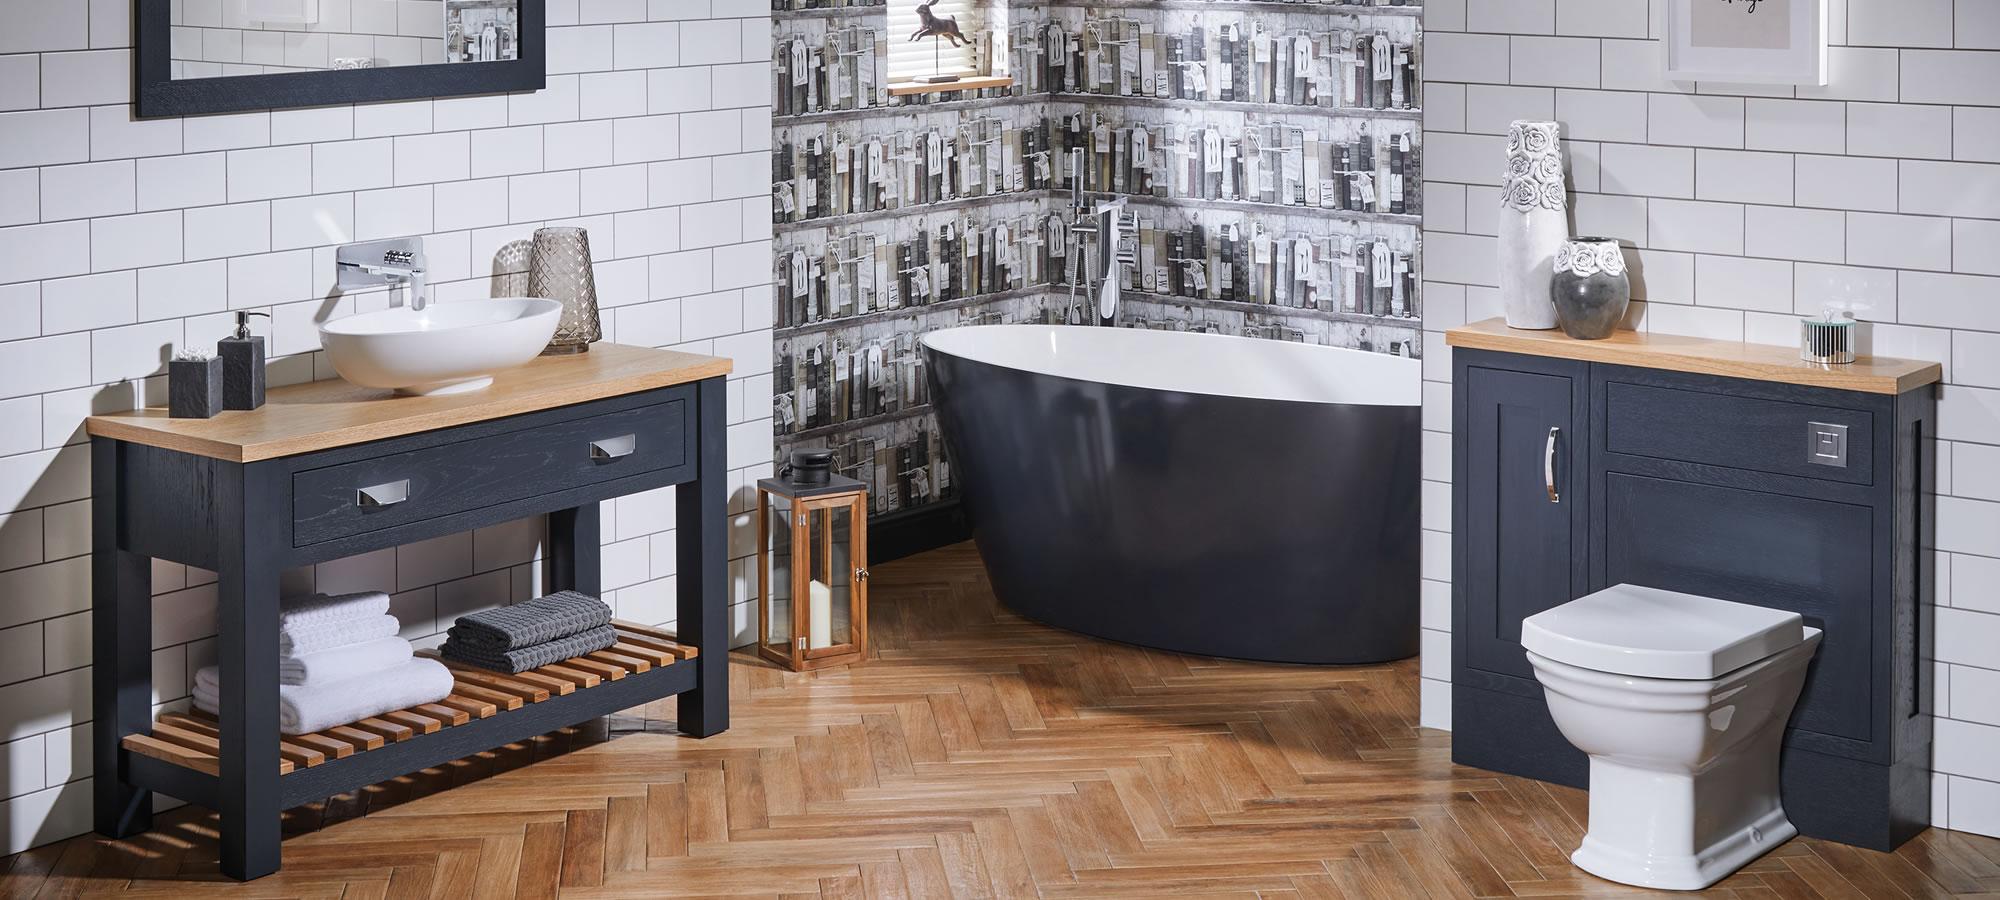 OHJ Bathrooms